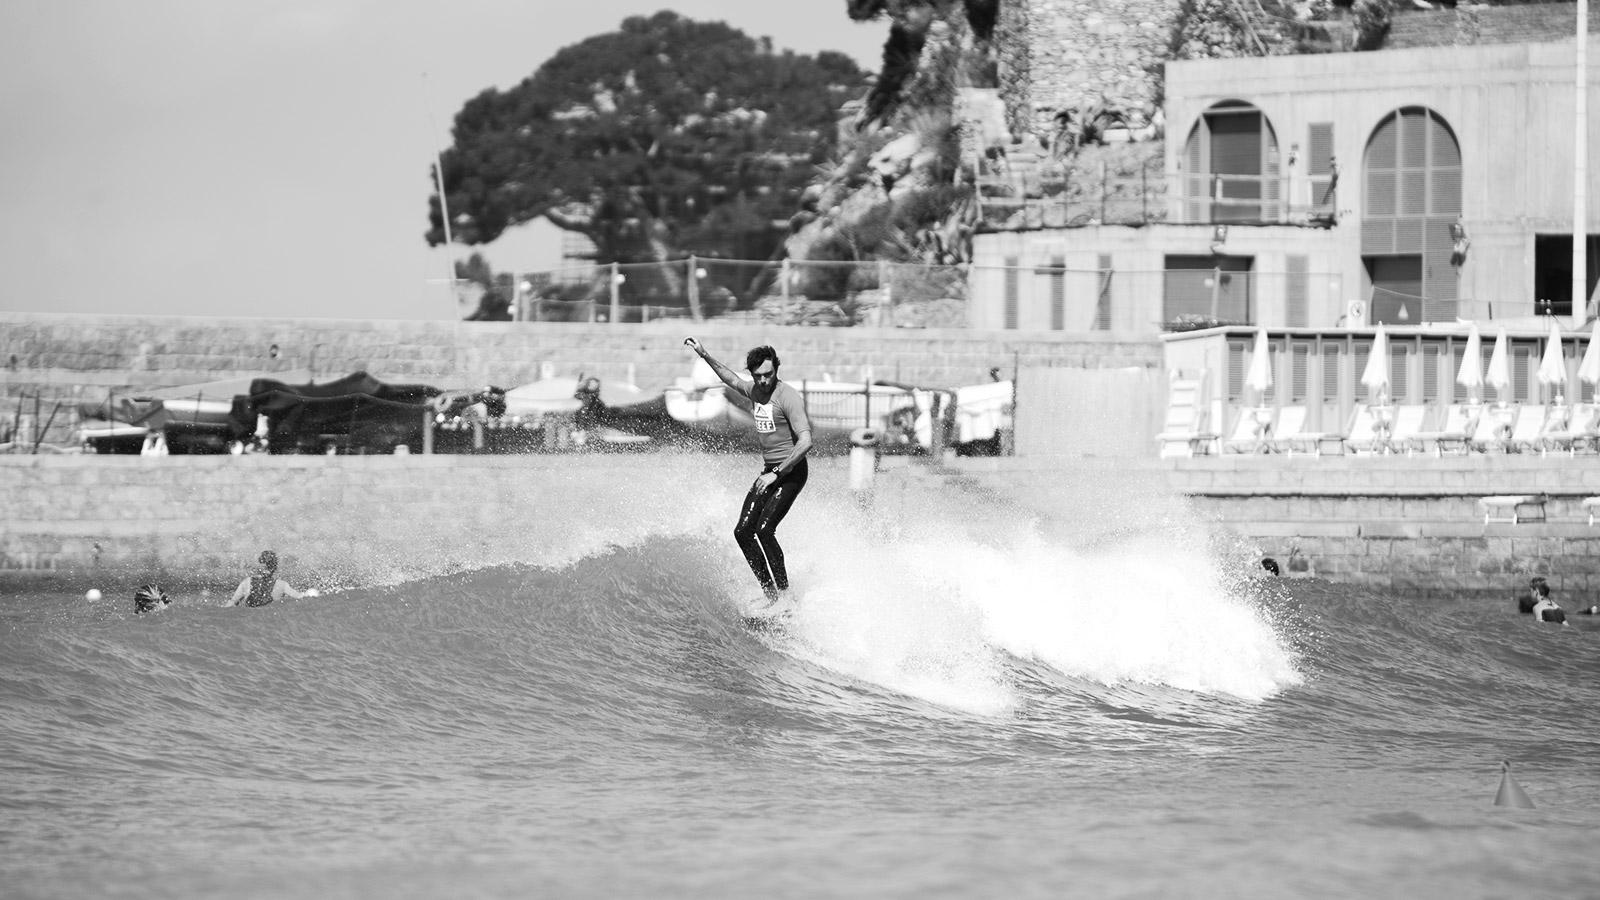 recco_surfestival_2016_matteo_fabbri_surfculture